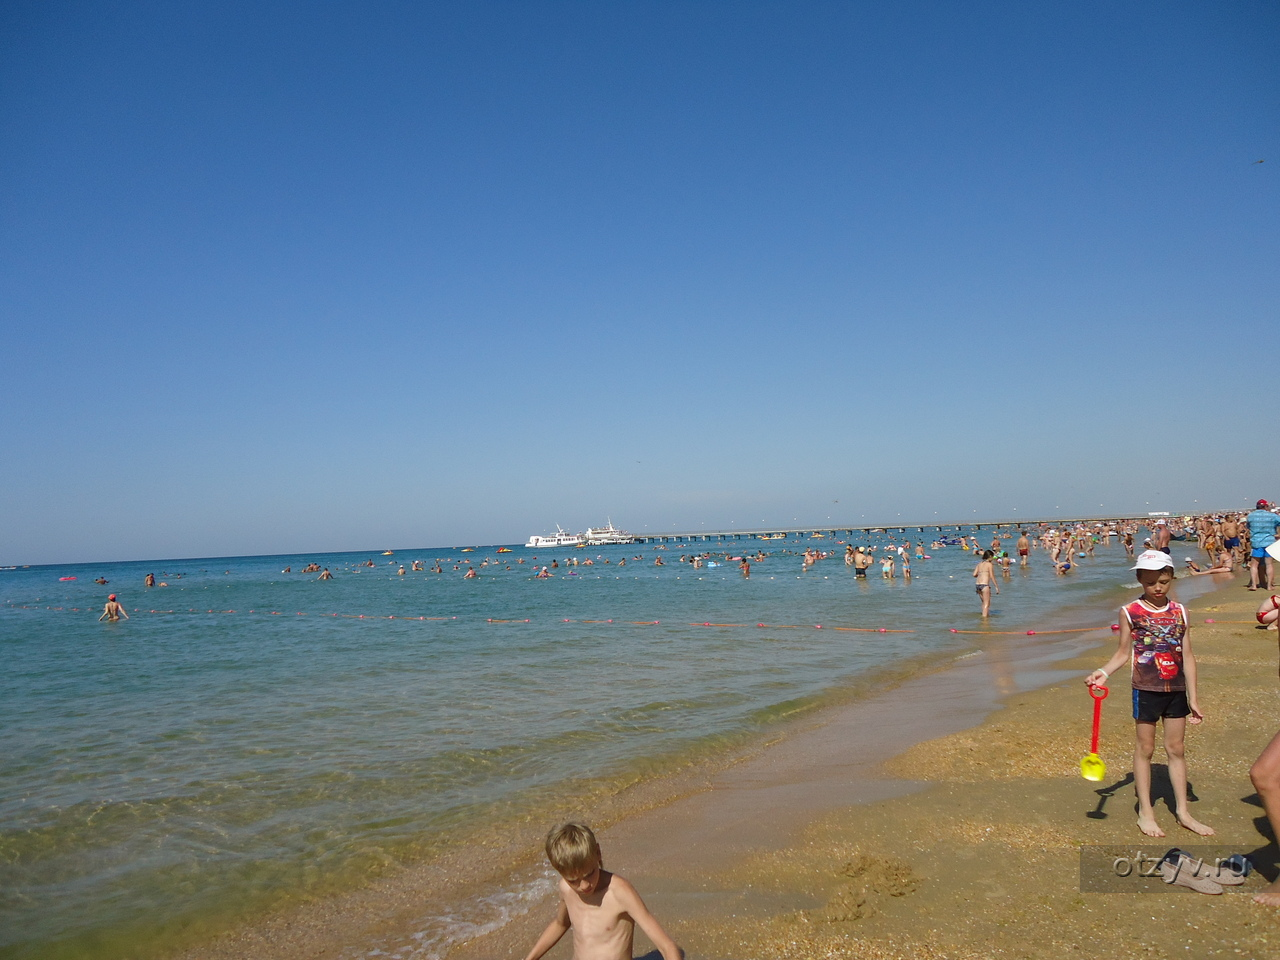 Поселок витязево фото пляжей и набережной